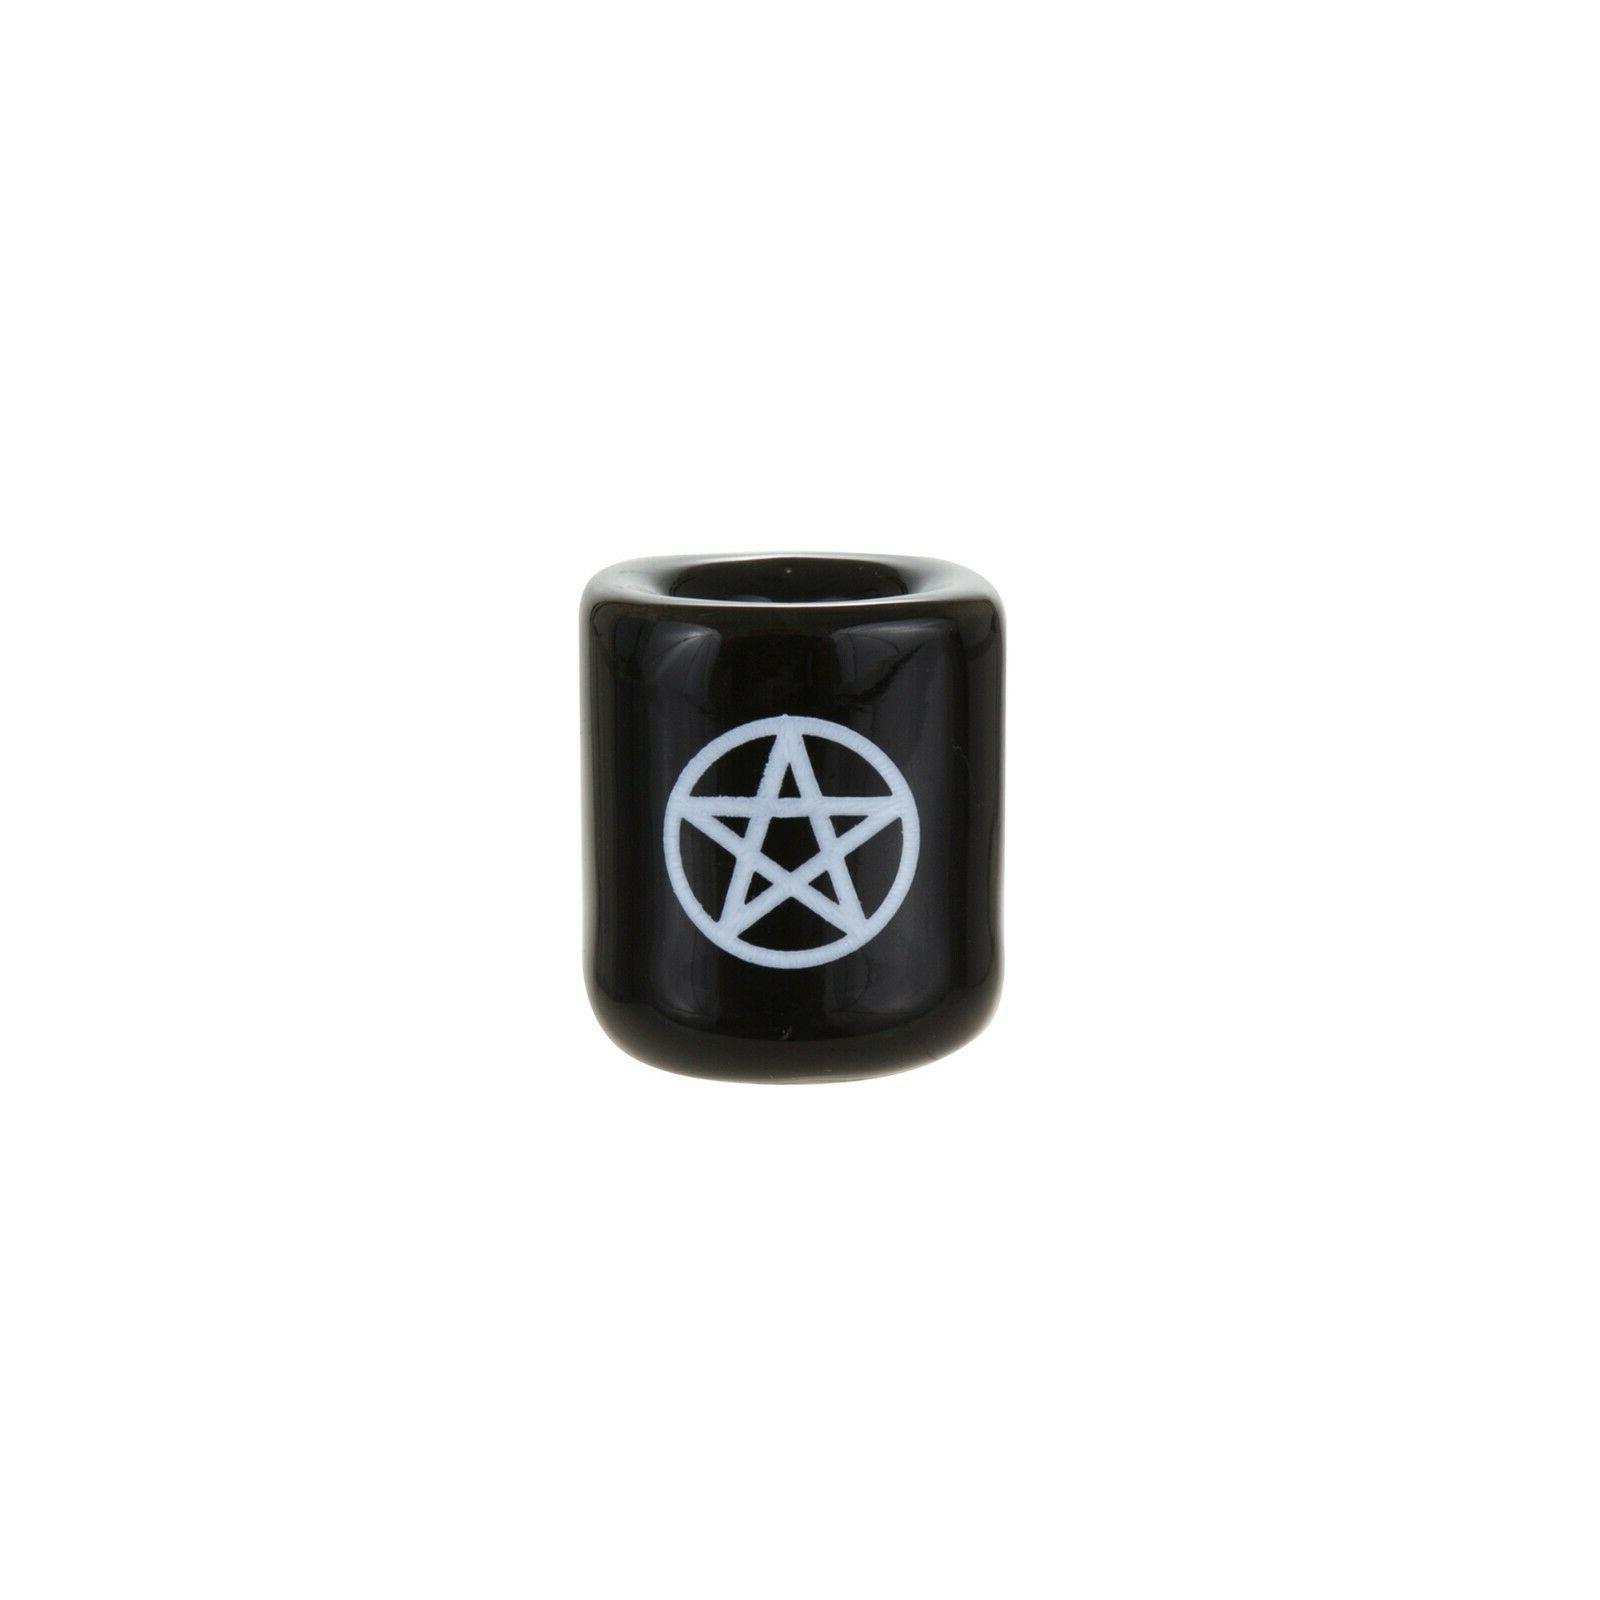 "Mega Candles - 1/2"" Chime Candle Holder White, Set of"